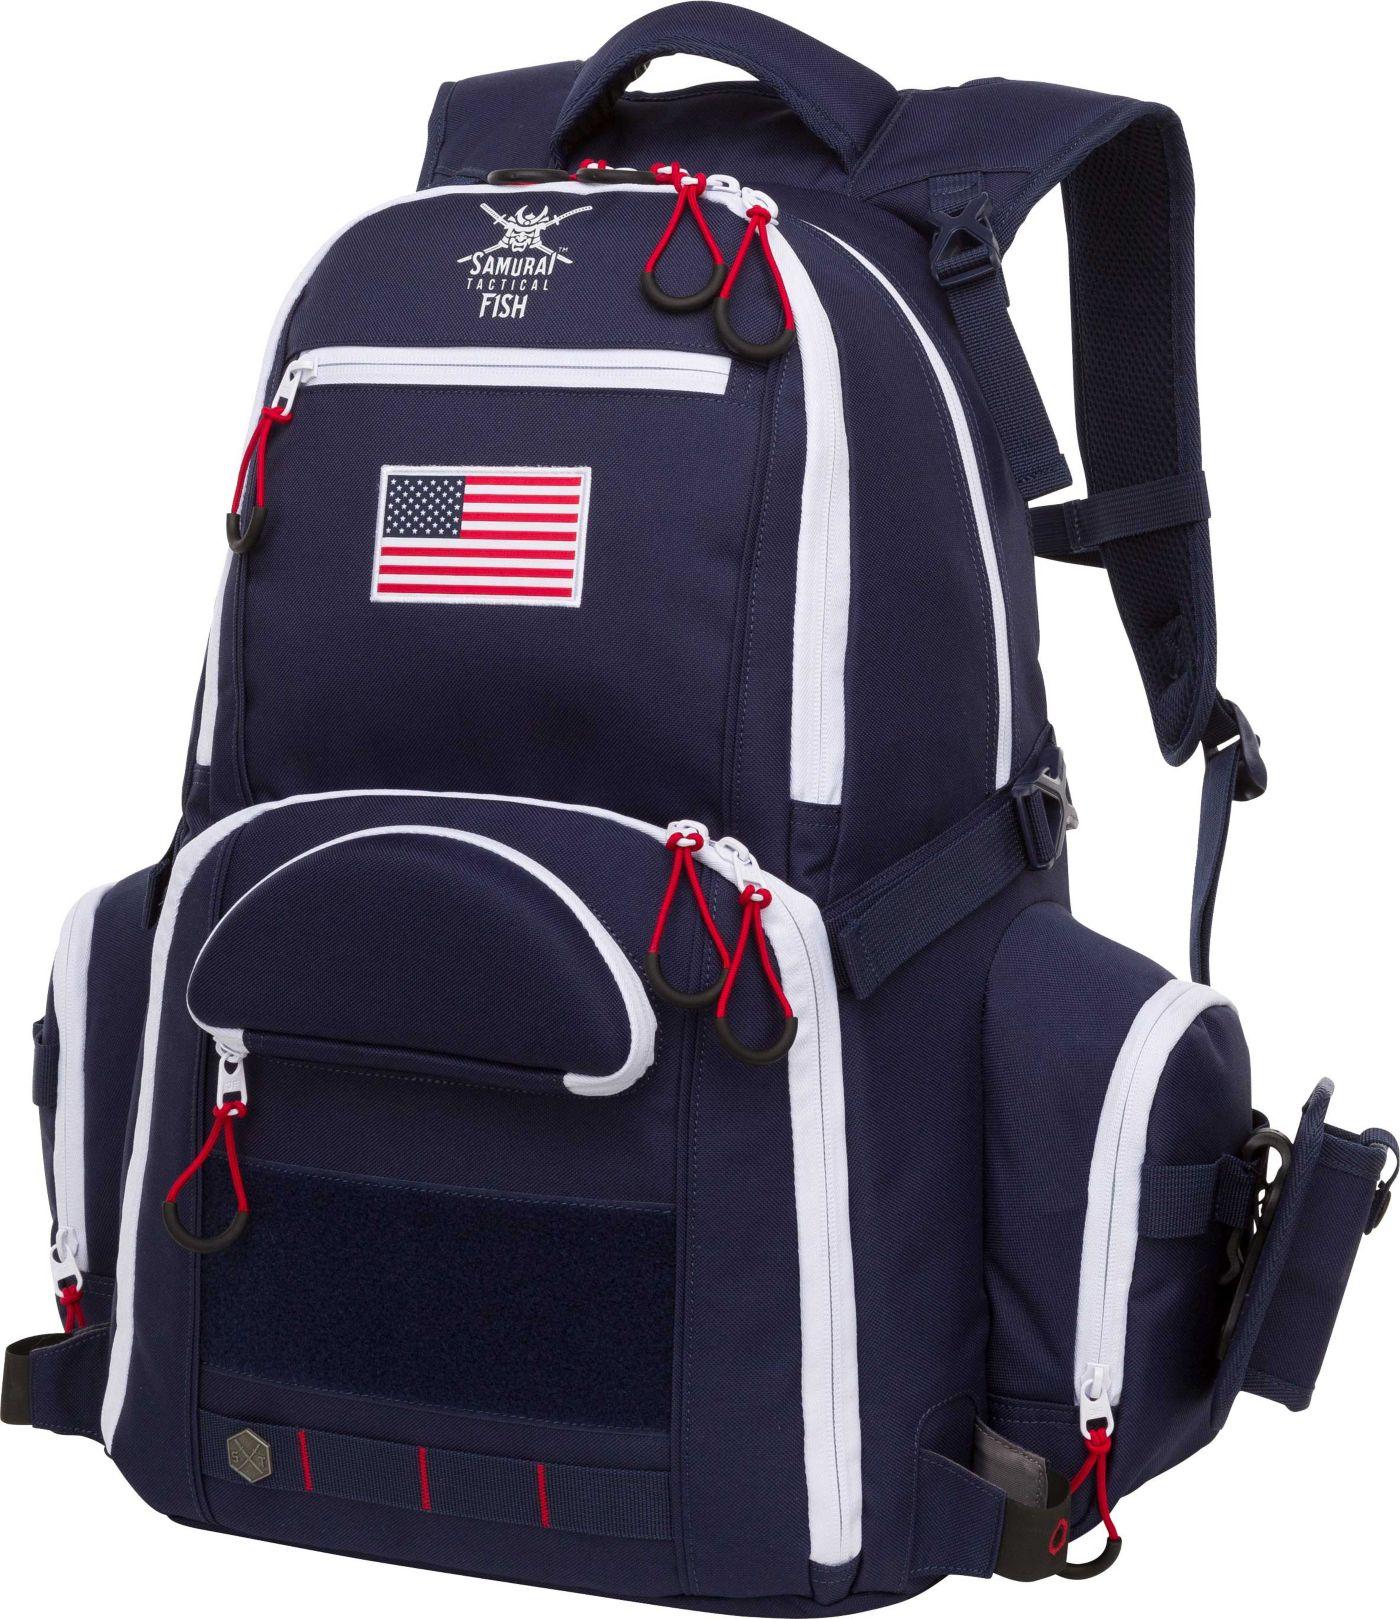 Samurai Tactical Hotate Tackle Back Pack